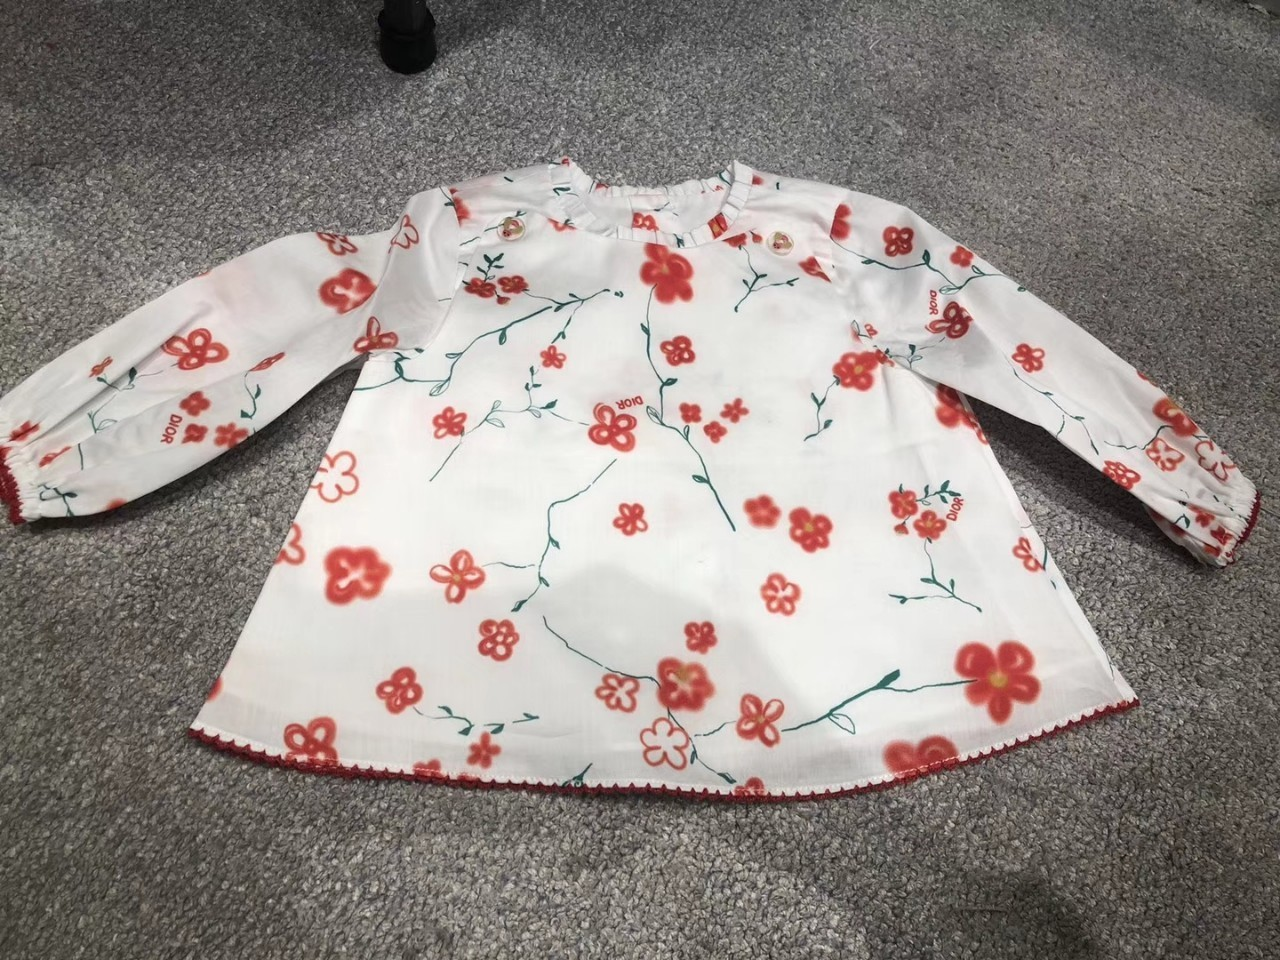 kids clothes Long Sleeves Shirt Girl Long Sleeves Whole Cotton Digital Printing Shirt High Set Shirt